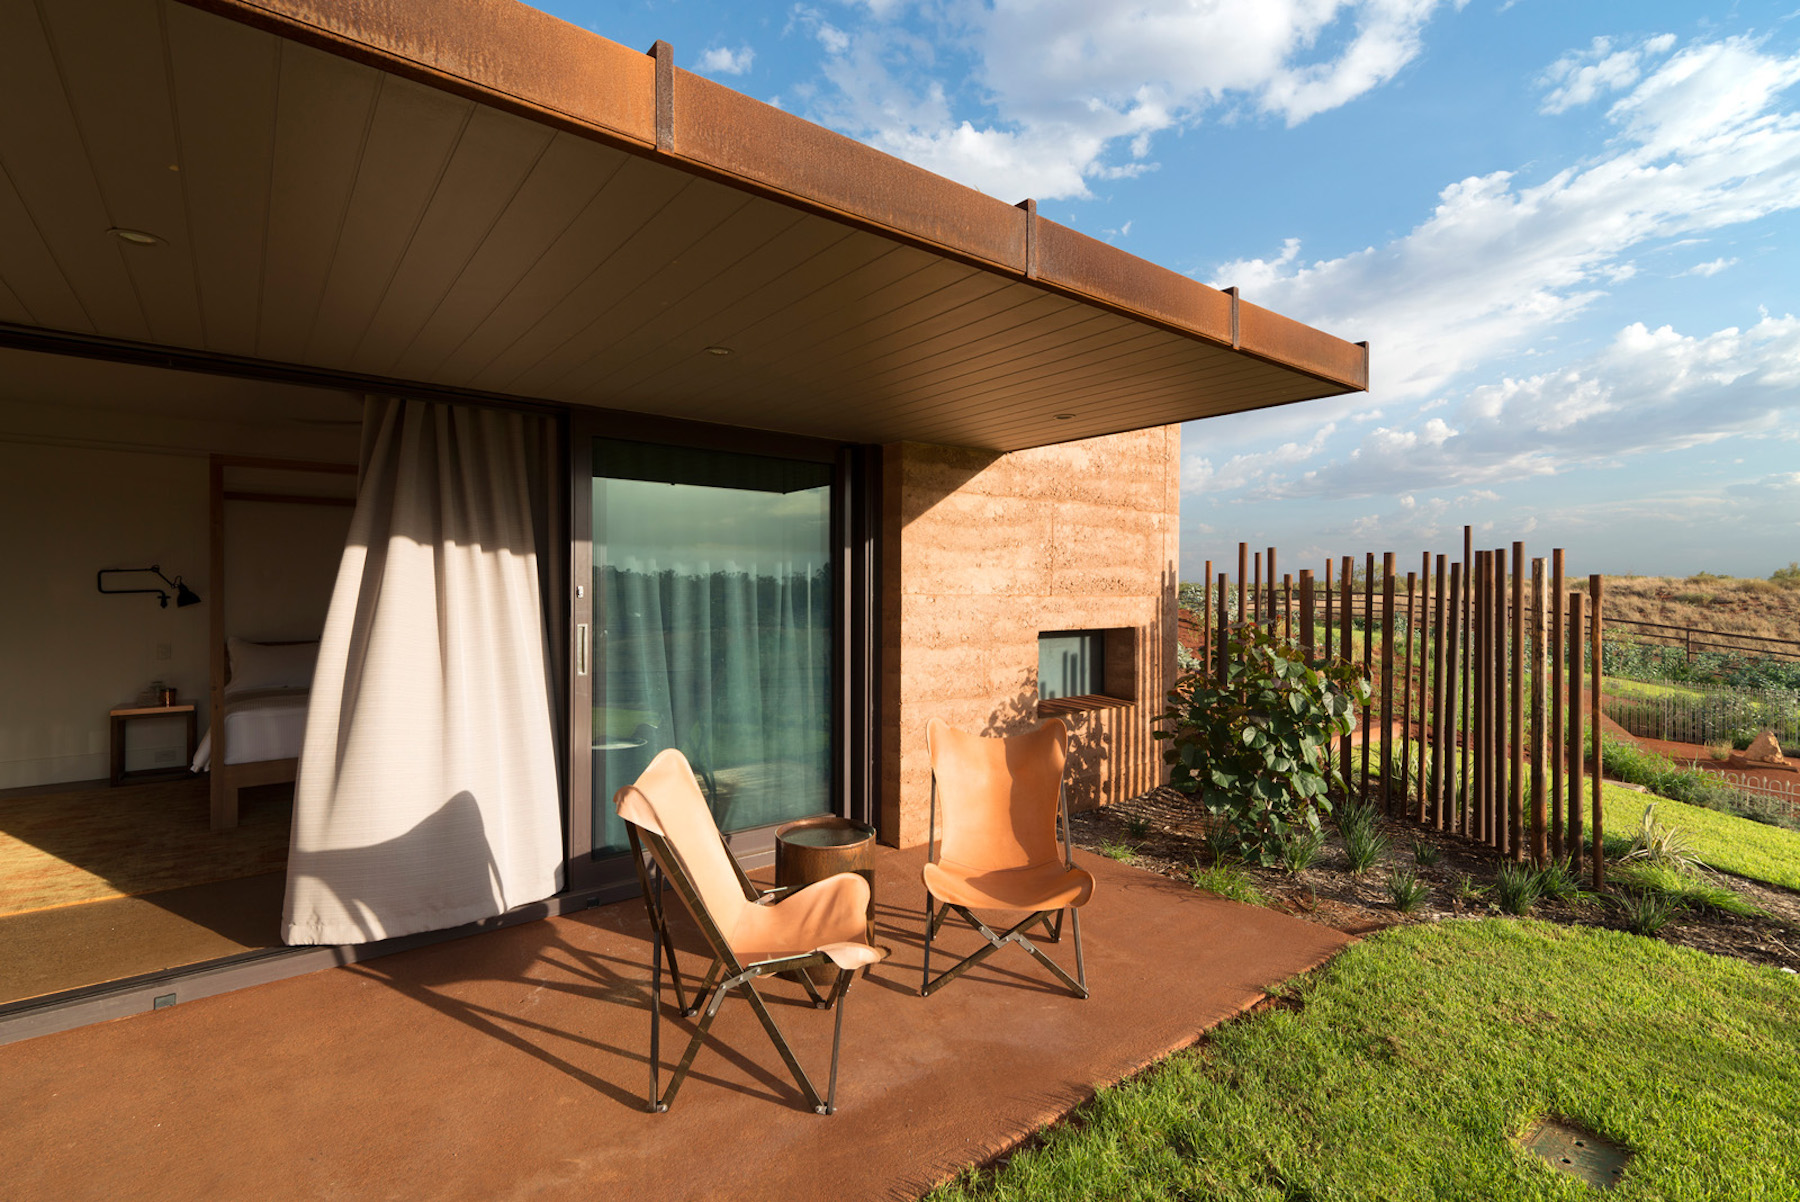 Proyecto de arquitectura del paisaje de Luigi Rosselli Architects